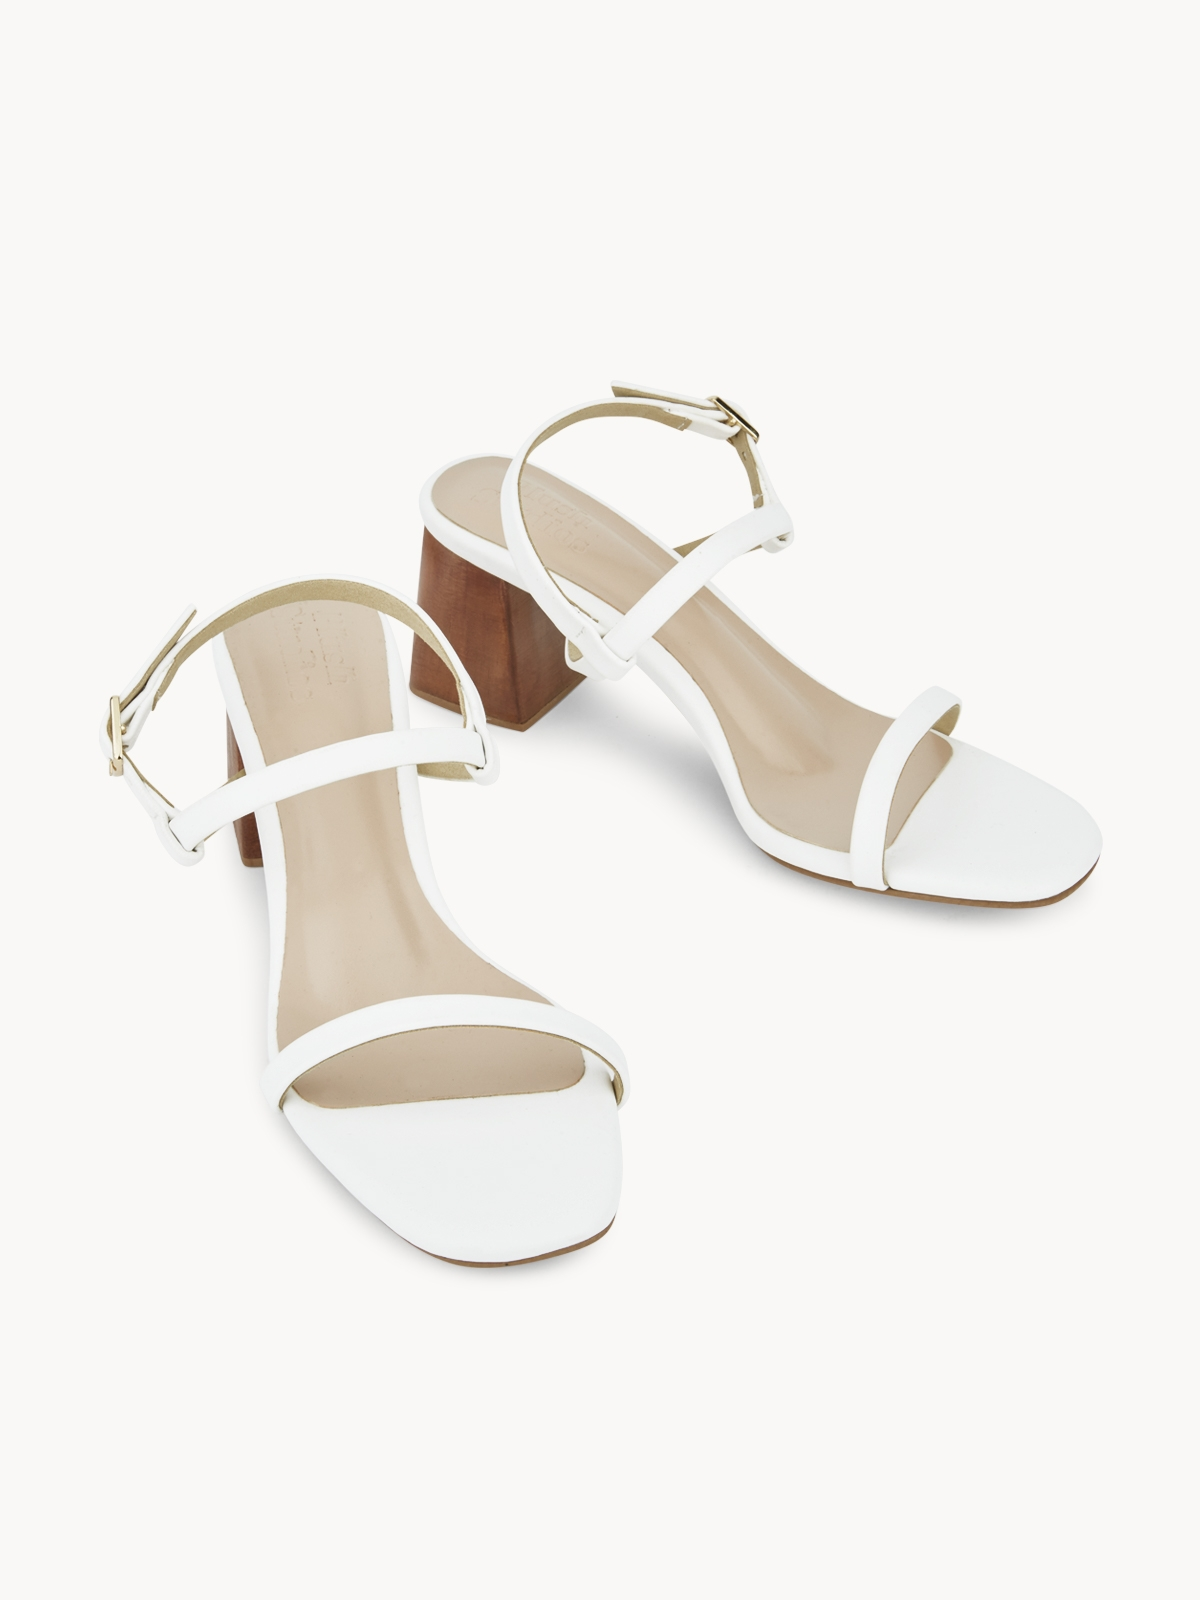 Plush Studios Kara Block Sandals White